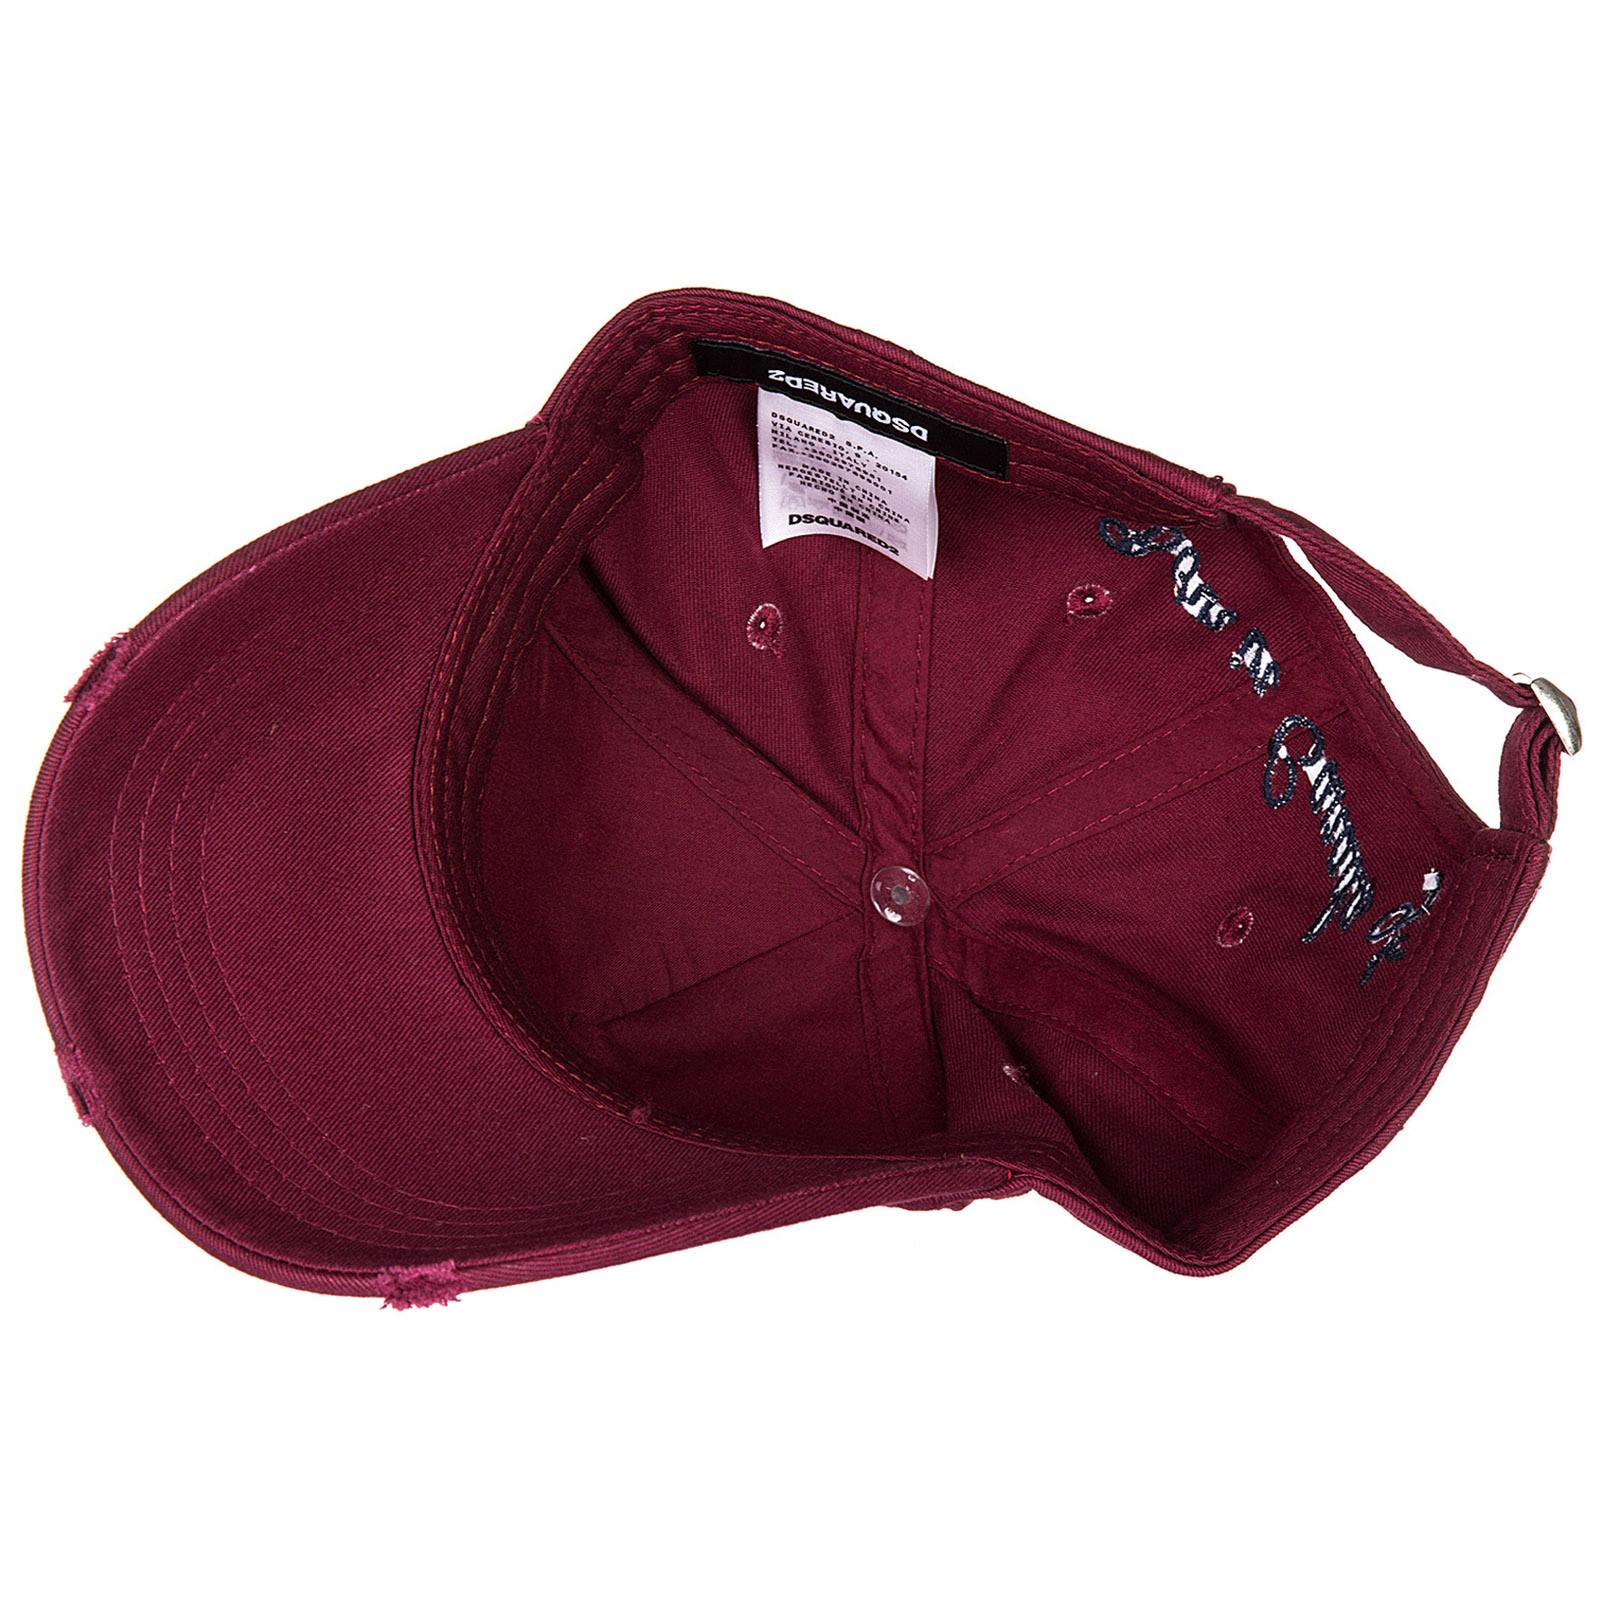 Baumwolle kappe verstellbar herren baseball cap basecap hut  gabardine